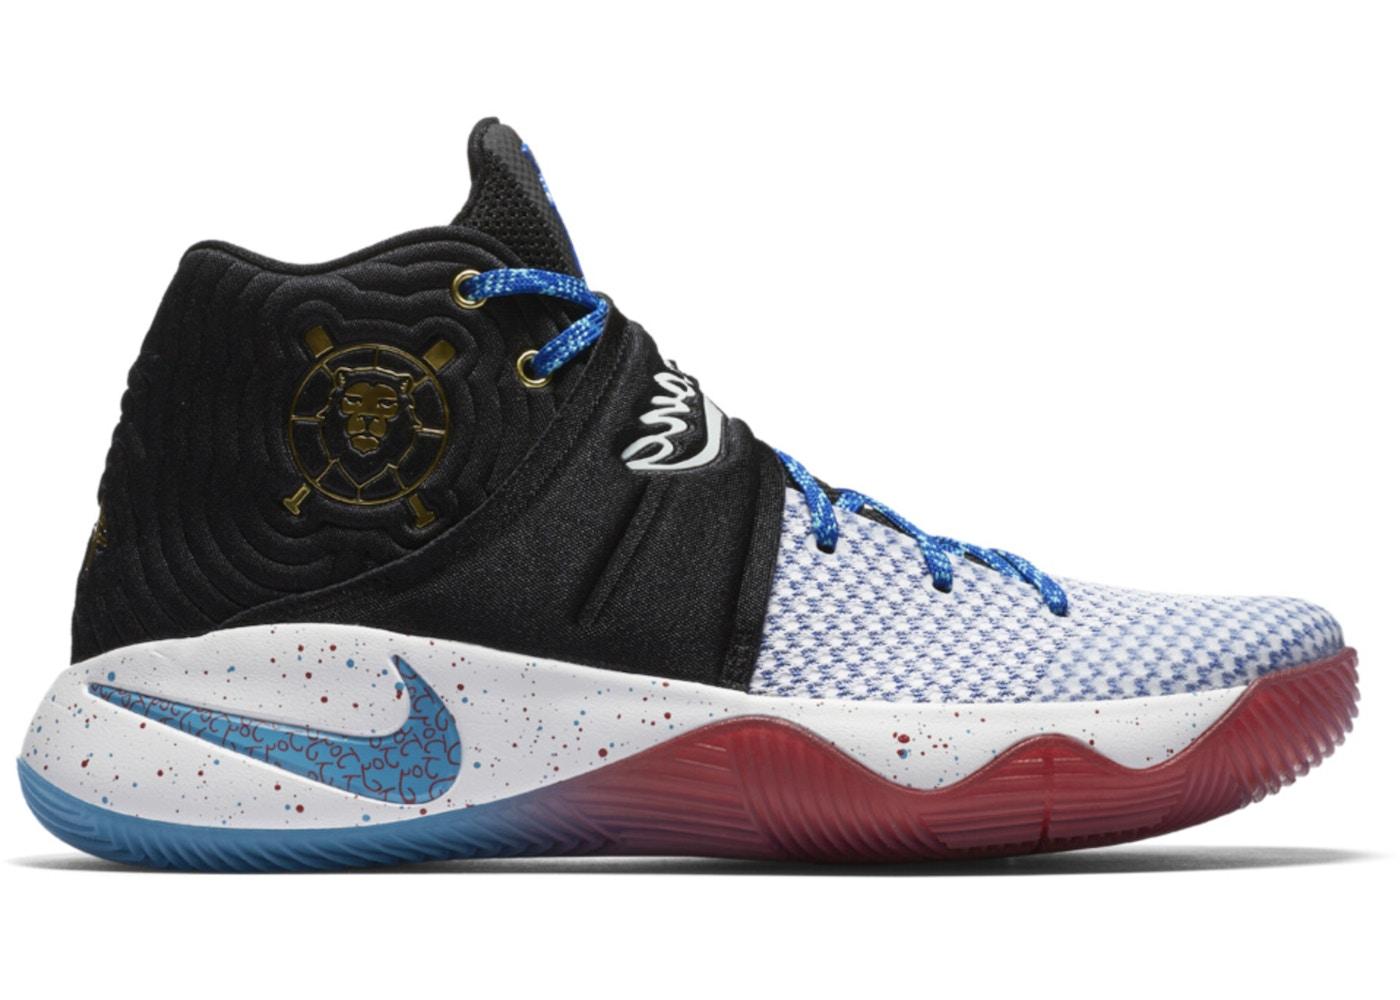 separation shoes 71bfd 94495 Kyrie 2 Doernbecher